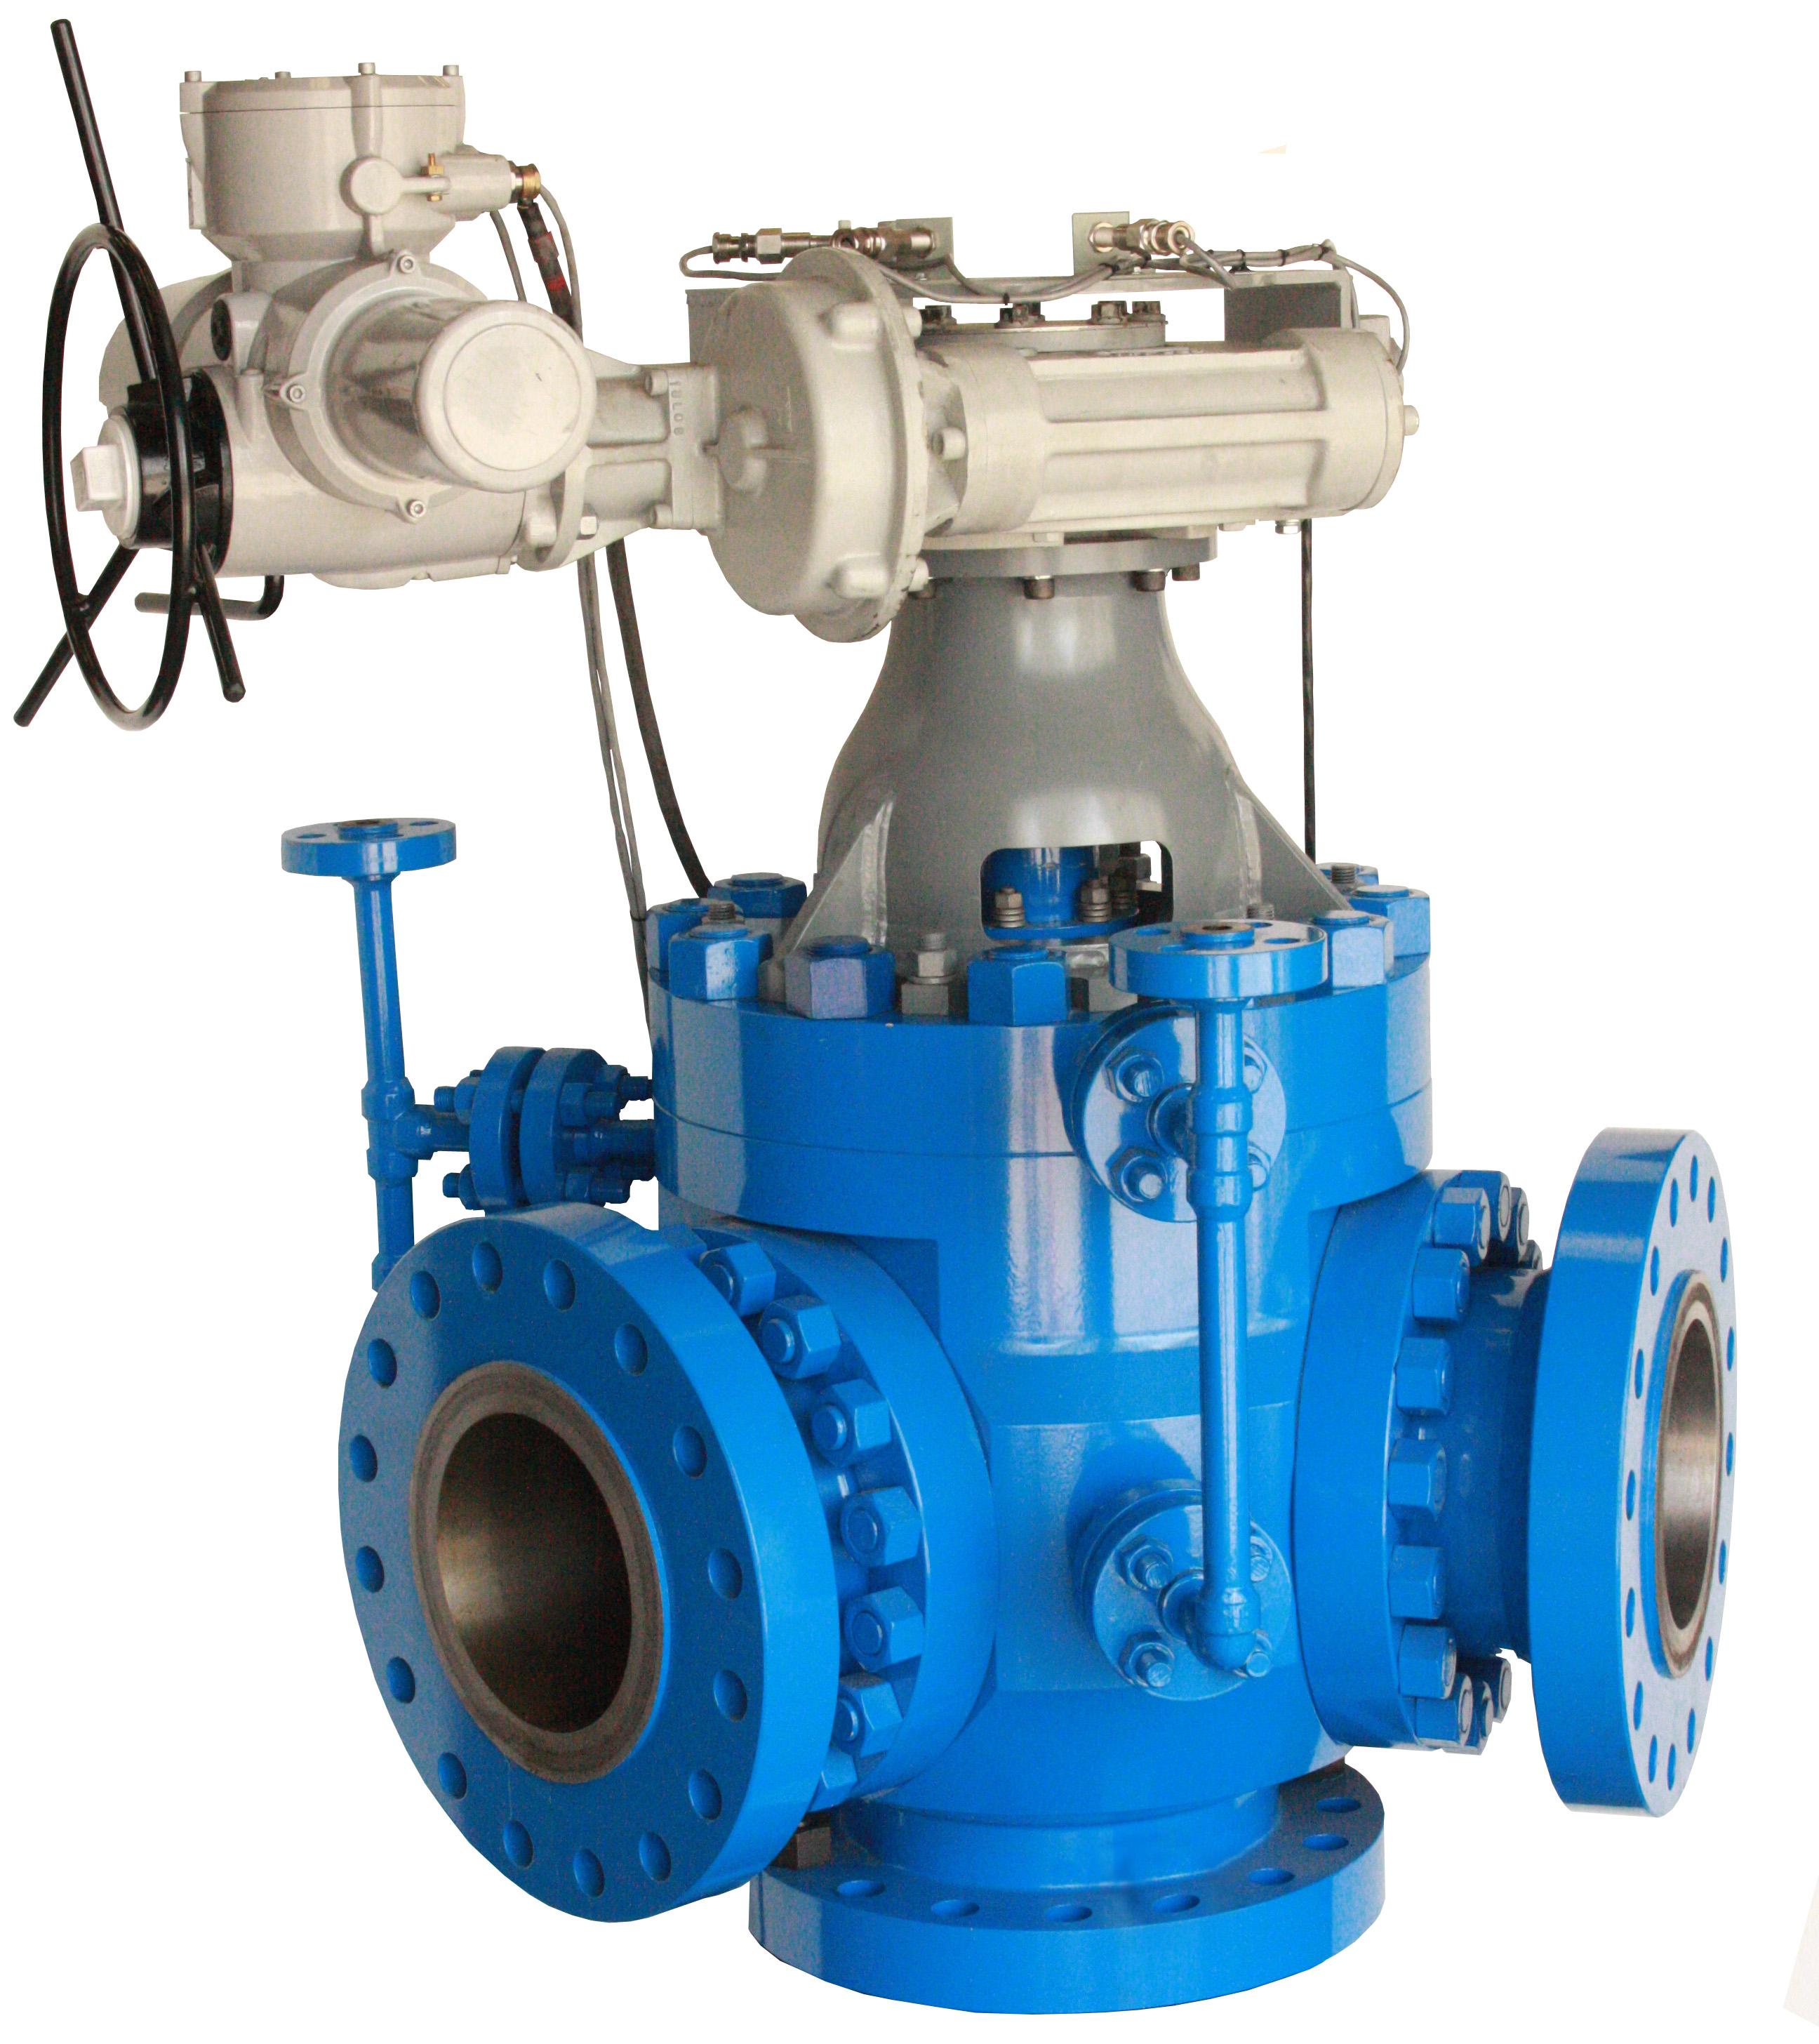 4 way ball valve laser burner circuit diagram switch valves for coking service valvtechnologies